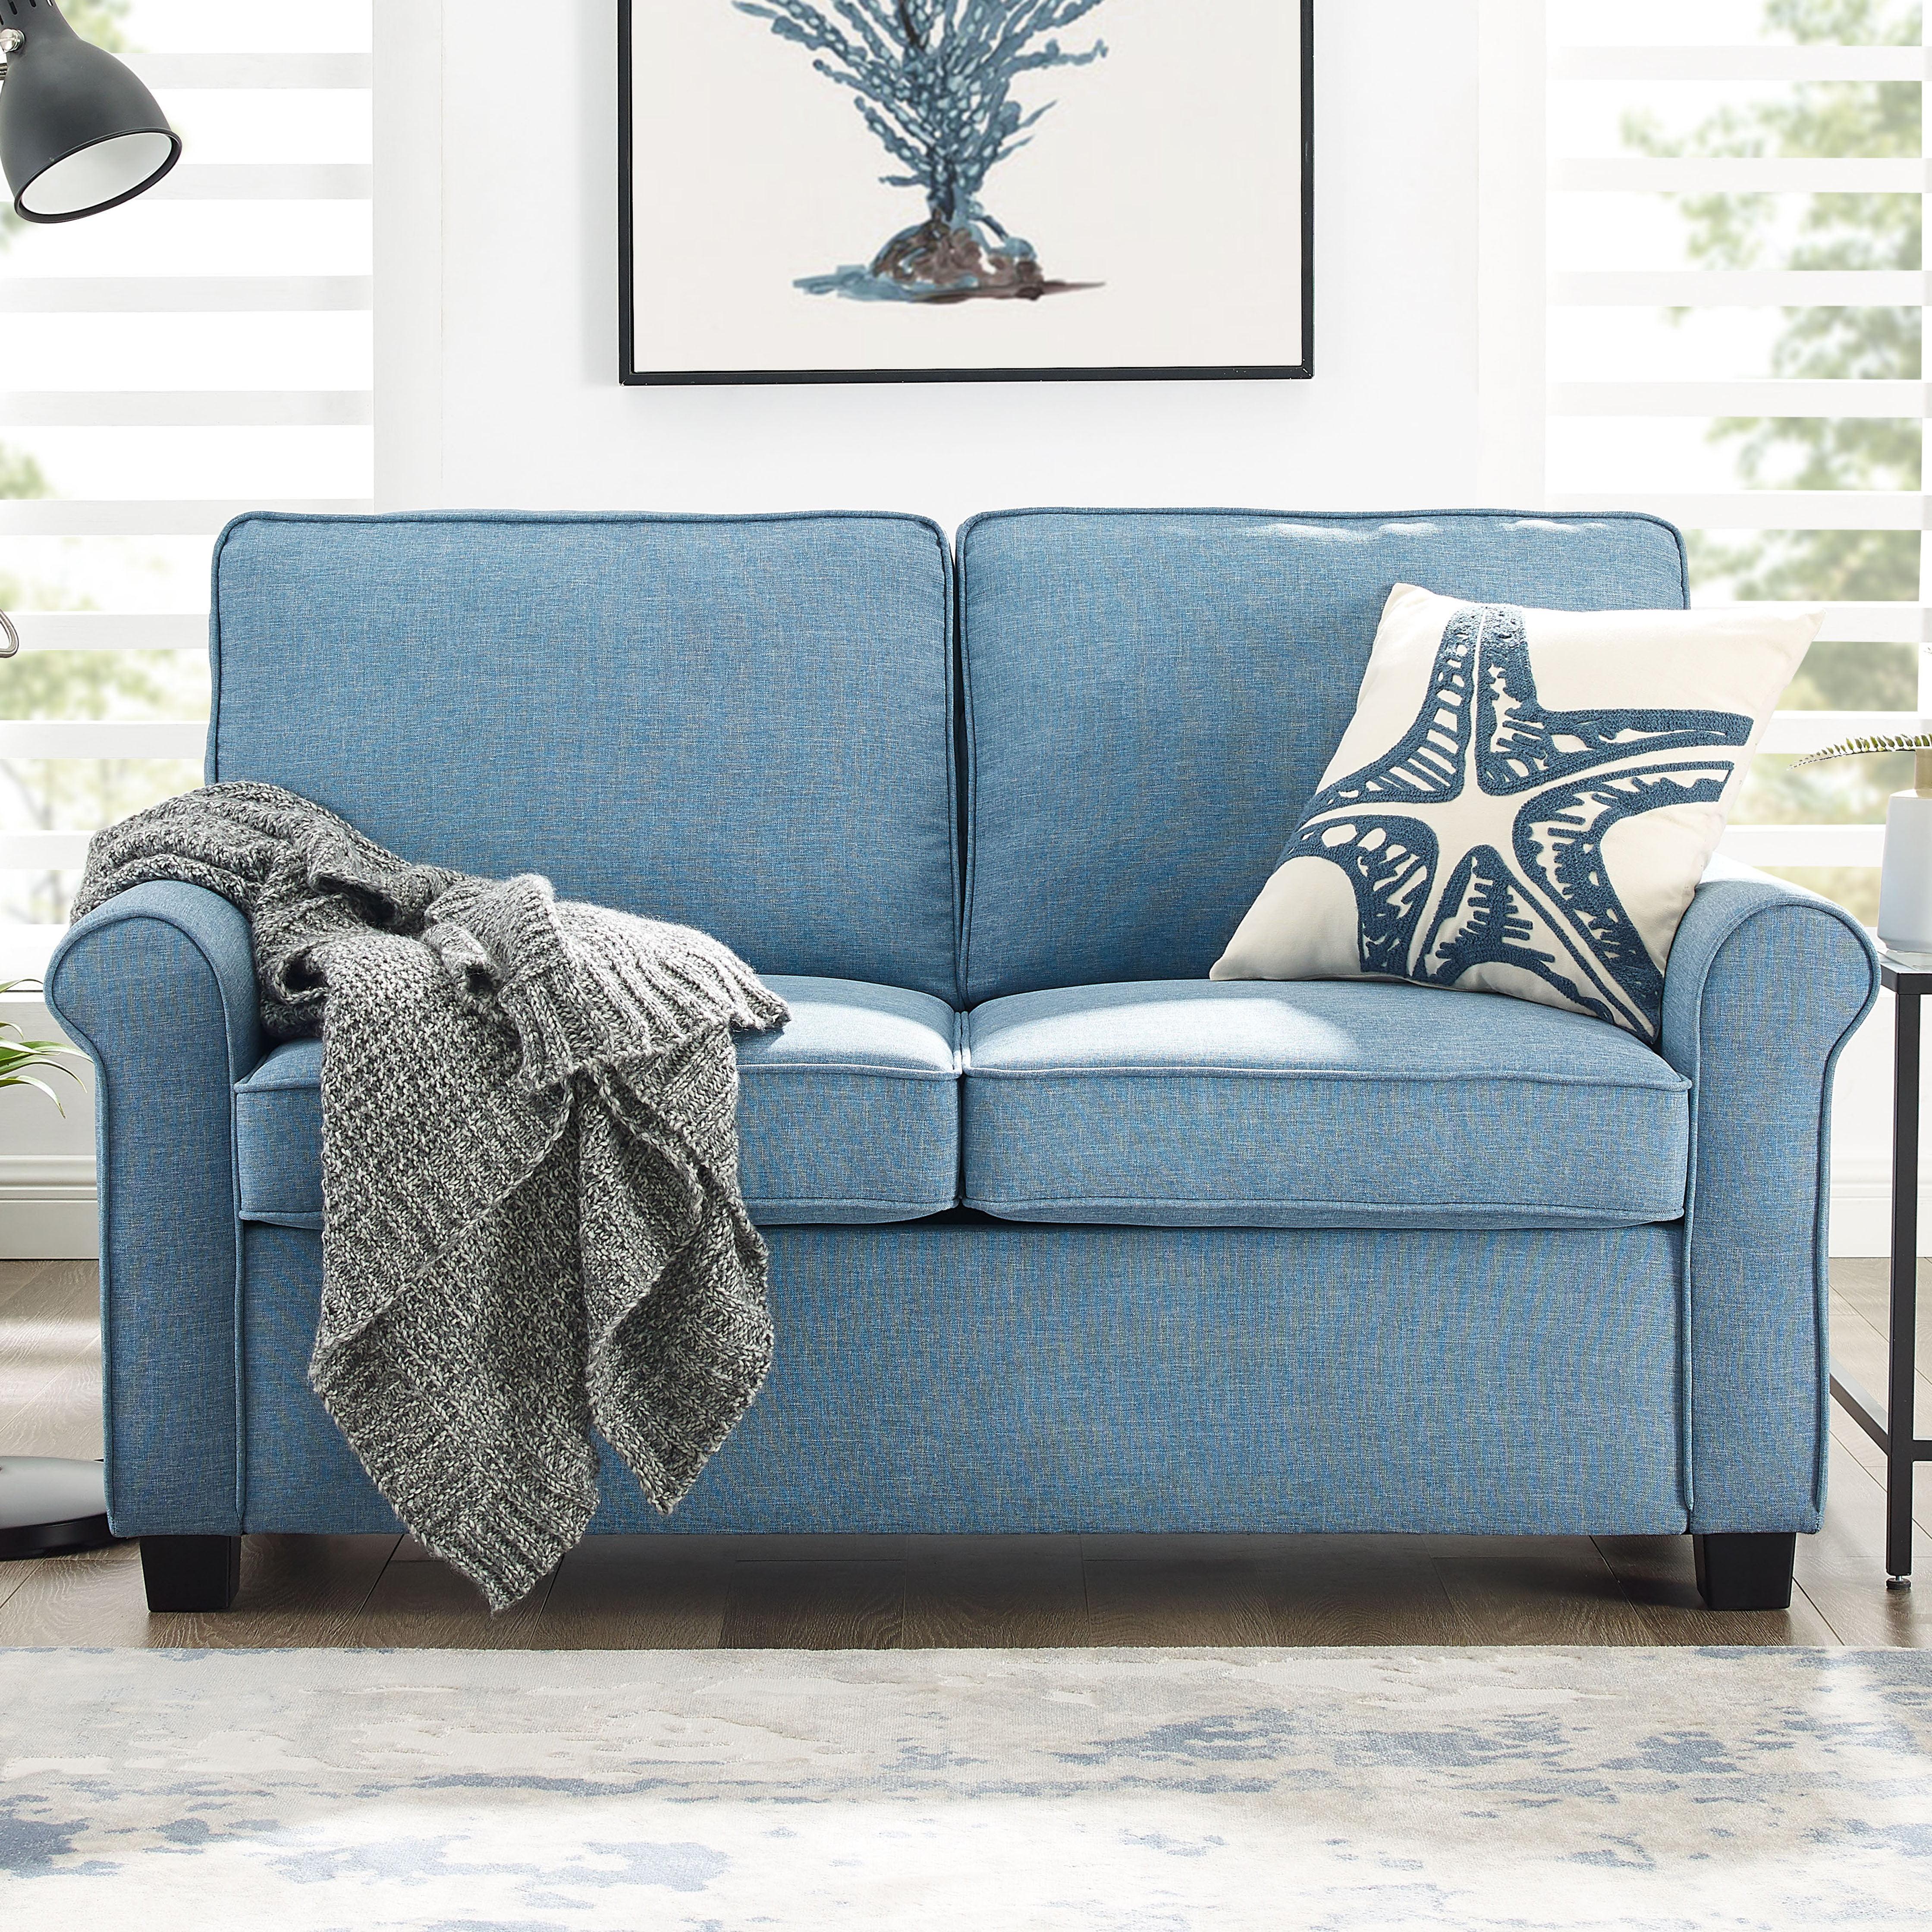 Mainstays Traditional Loveseat Sleeper With Memory Foam Mattress Light Blue Walmart Com Walmart Com